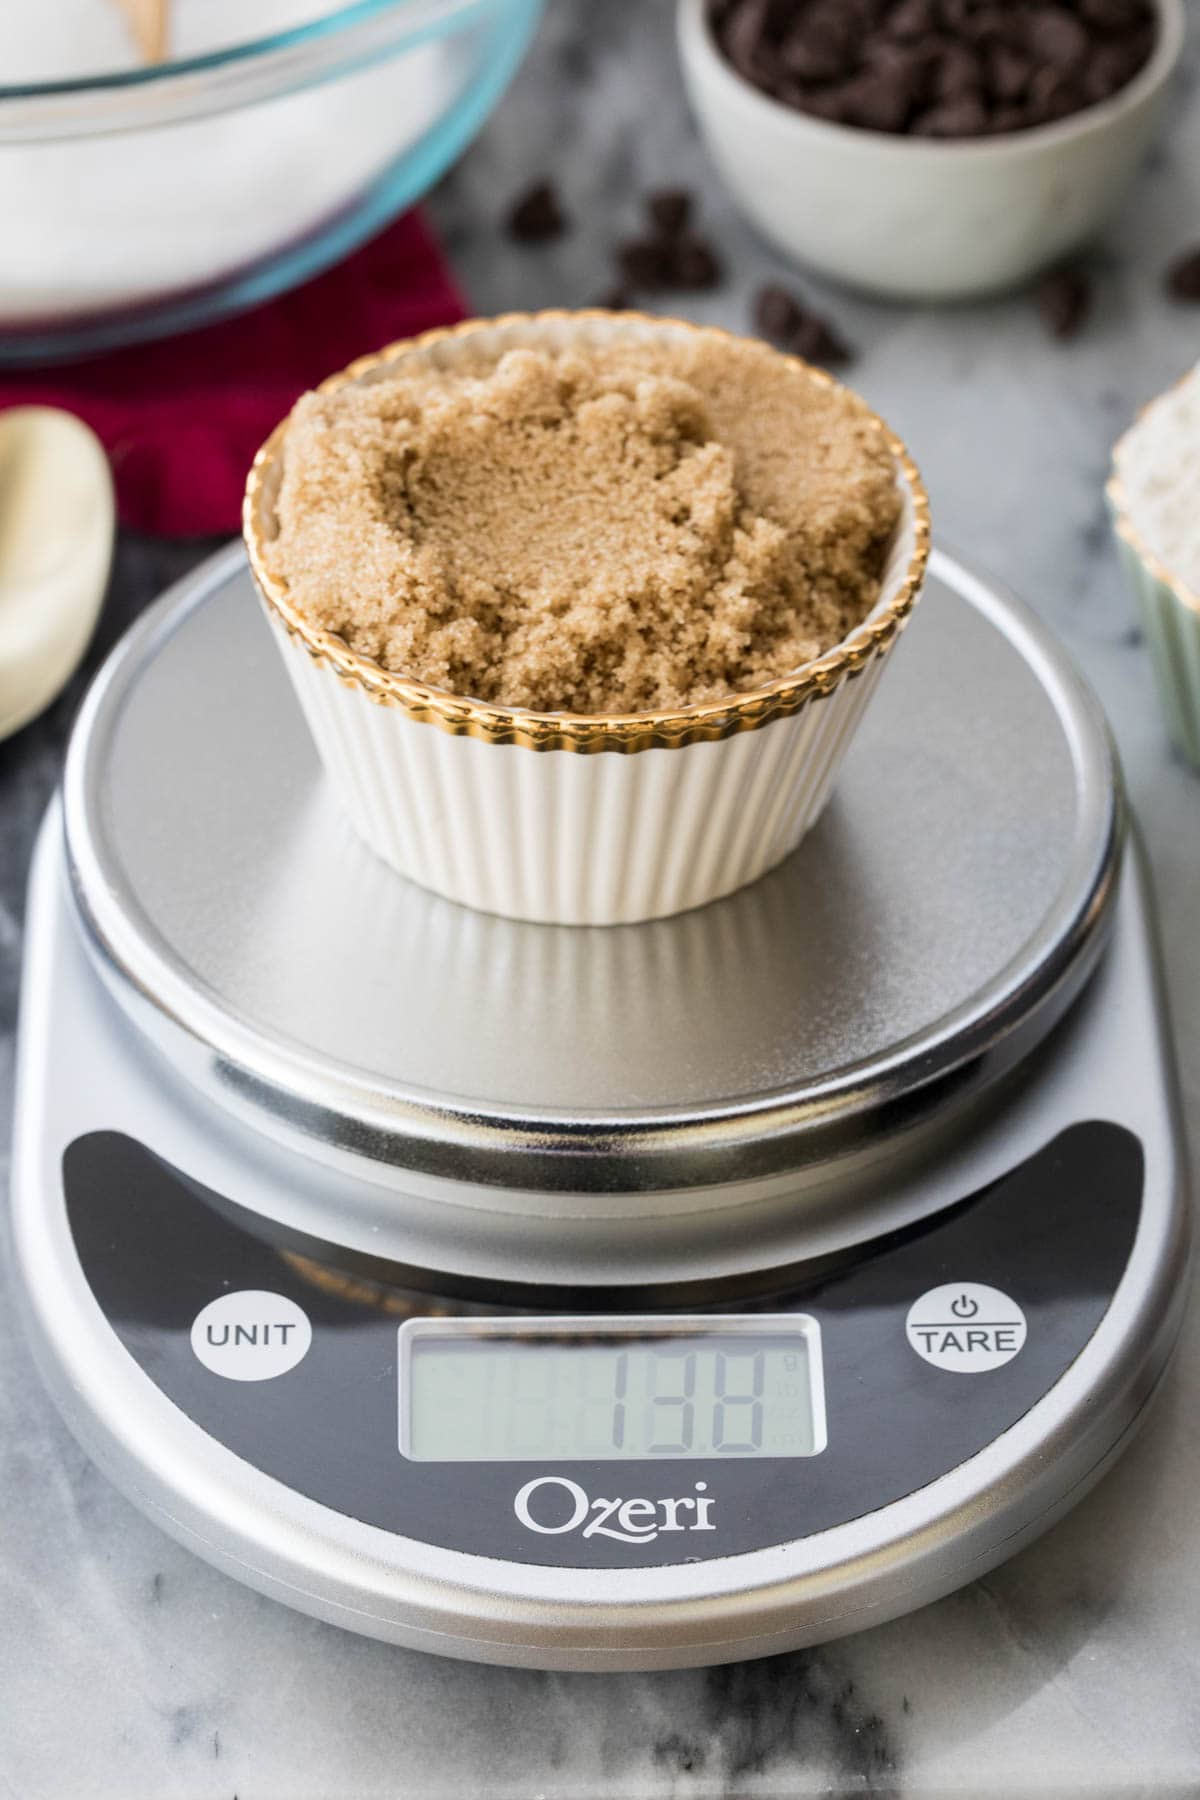 measuring brown sugar on kitchen scale